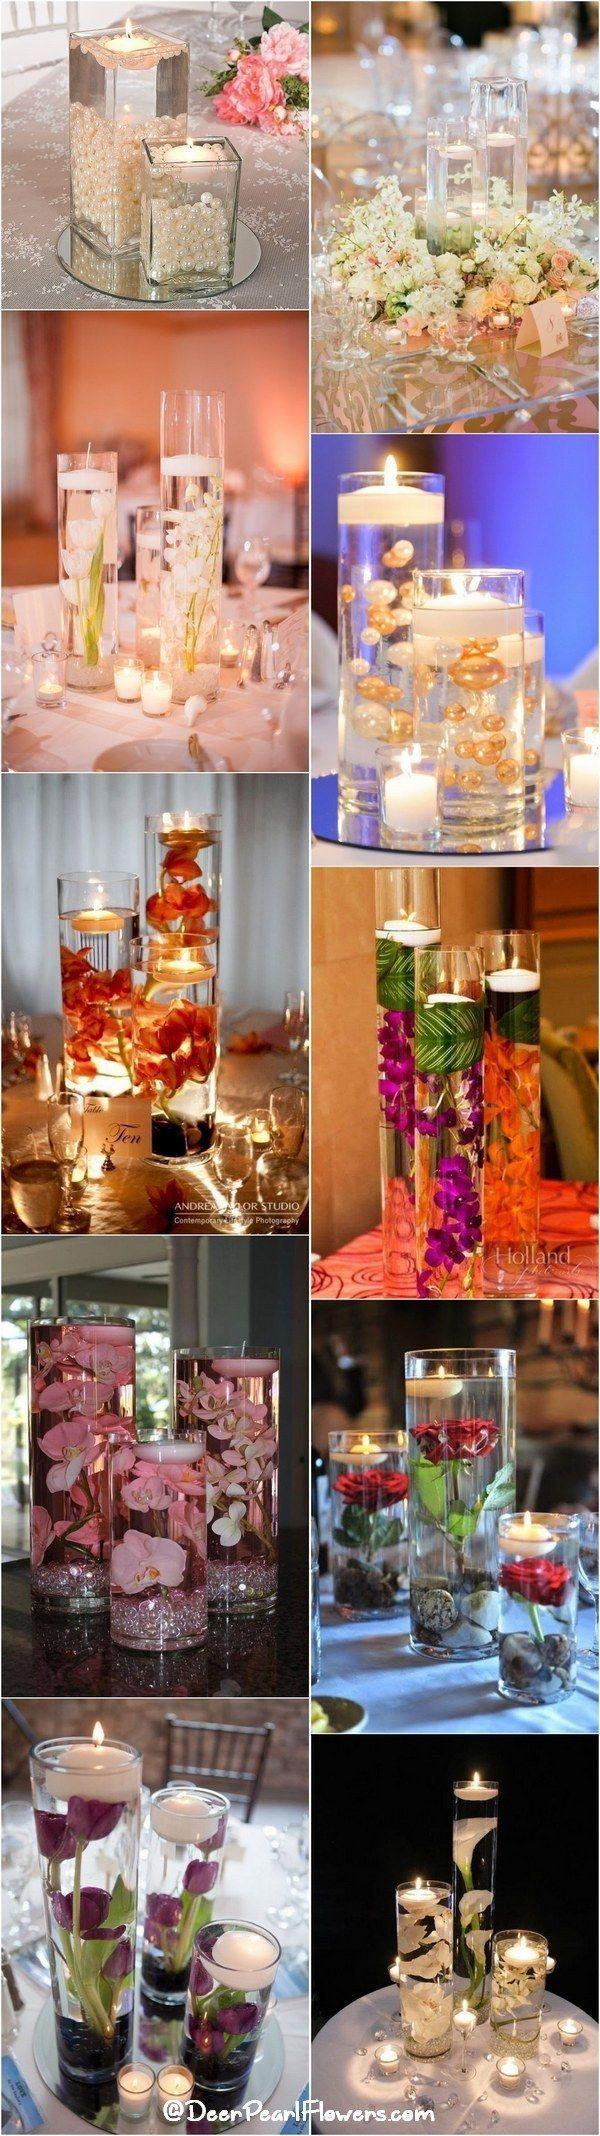 Floating wedding centerpiece ideas / http://www.deerpearlflowers.com/floating-wedding-centerpieces/